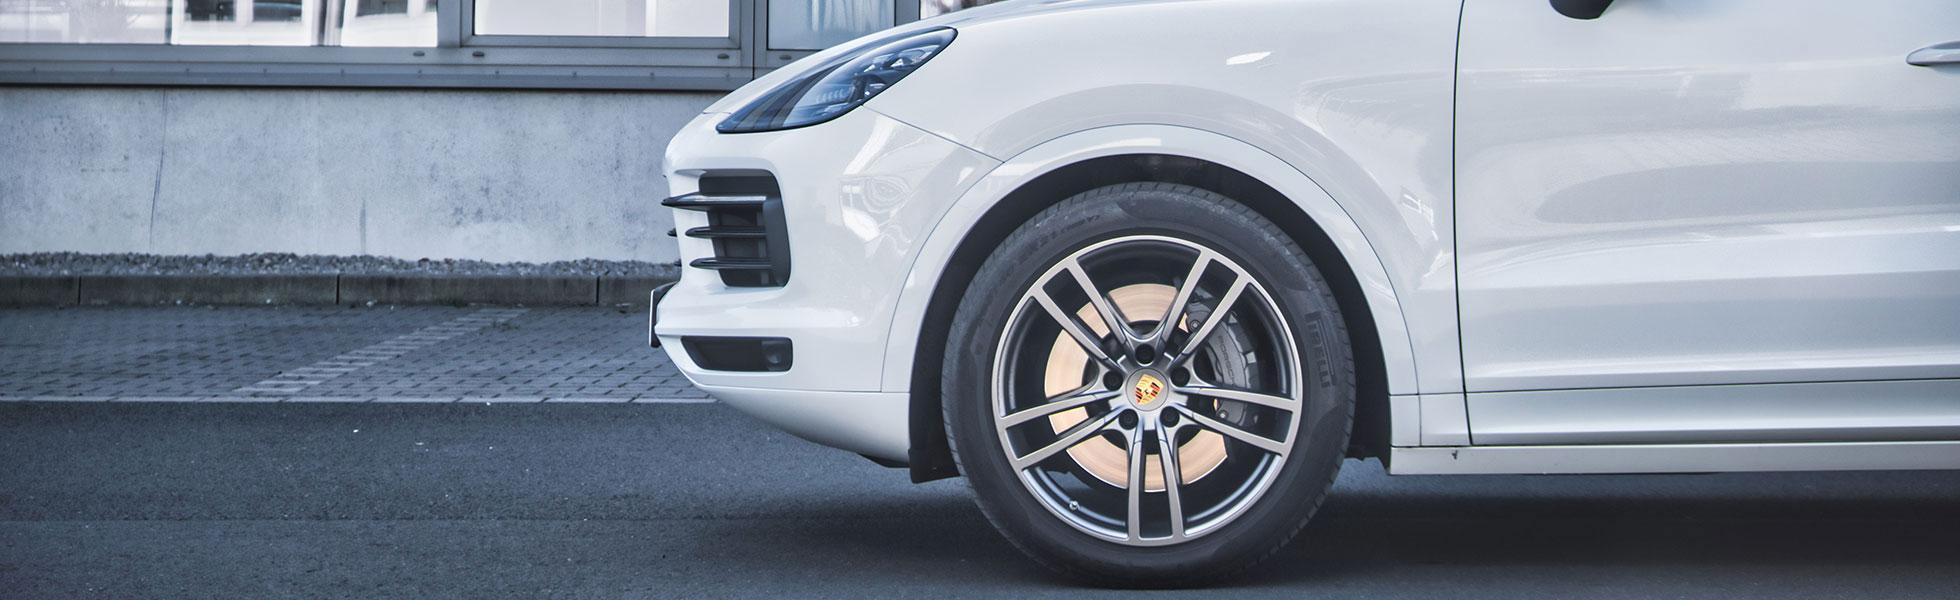 Porsche Cayenne Buy Rims & Complete Wheels